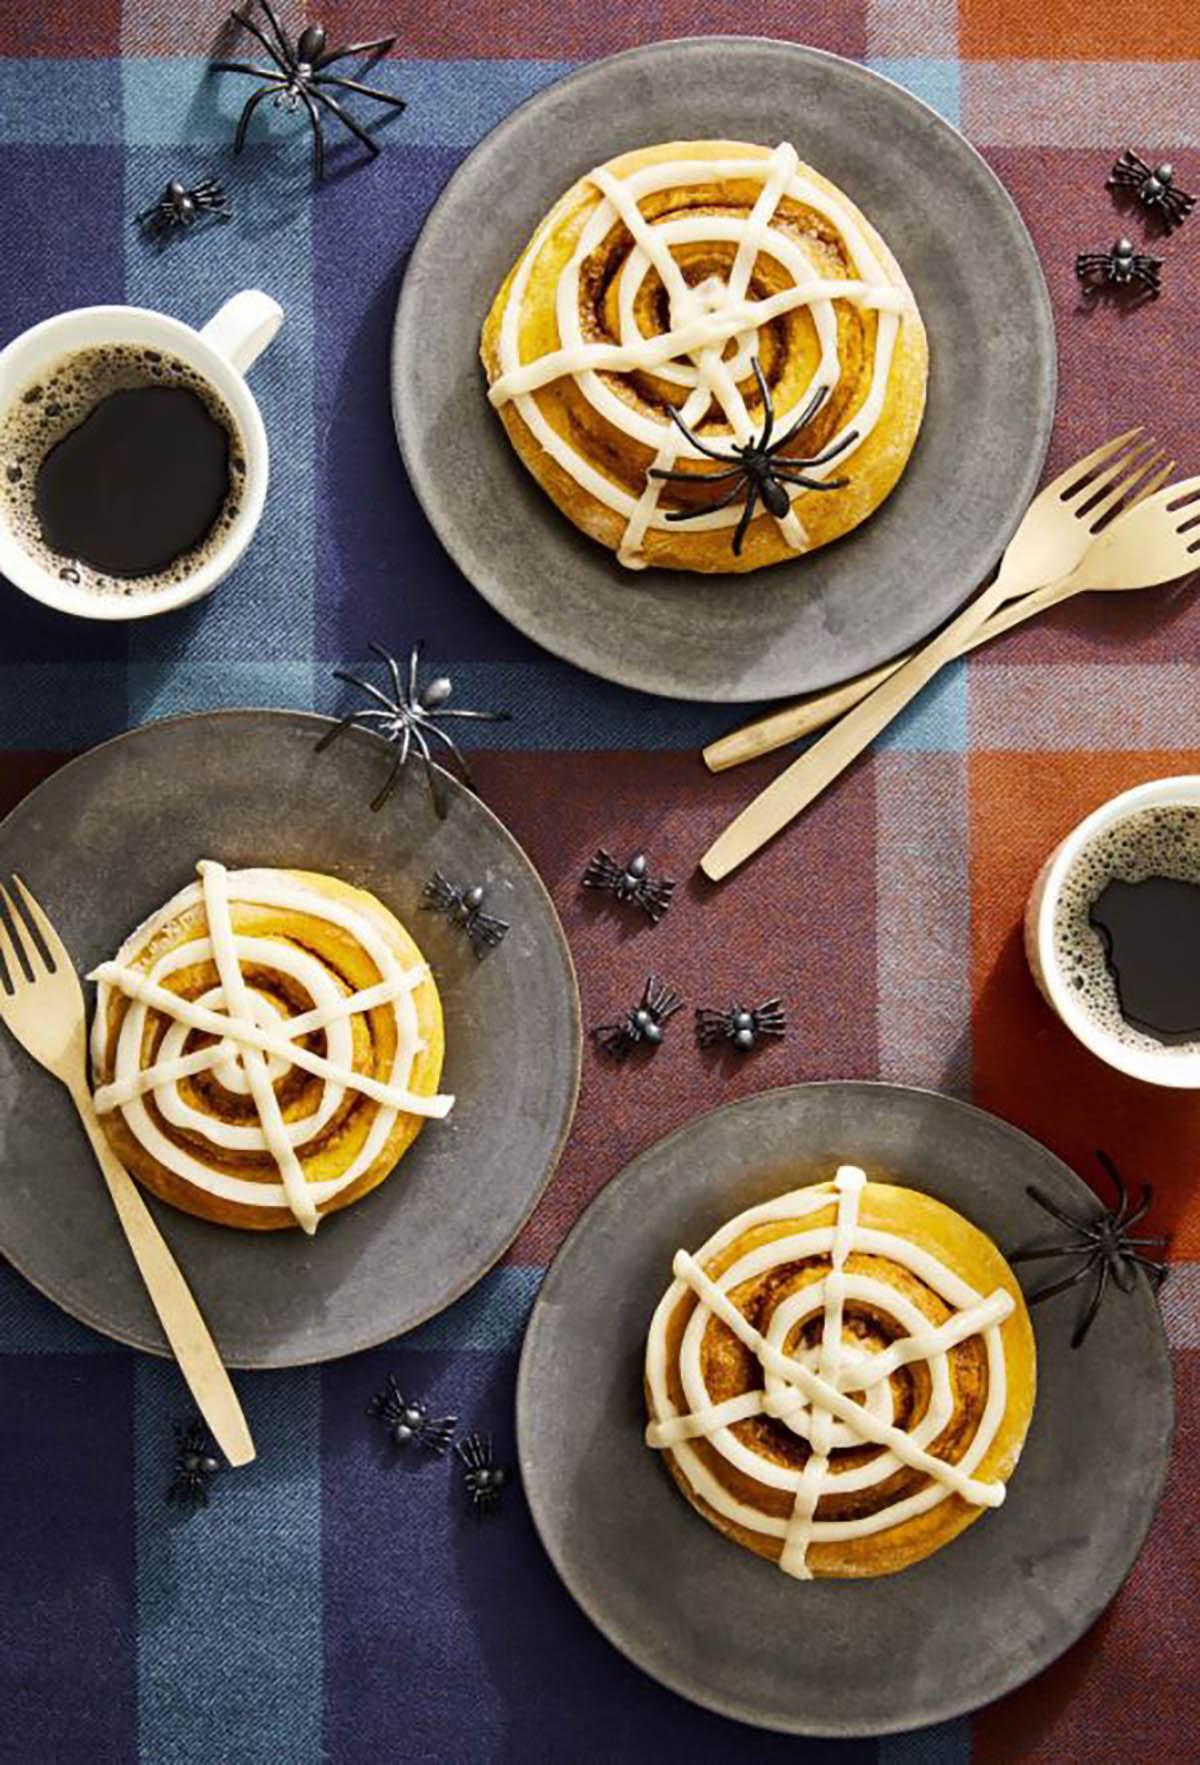 Pumpkin-Spiced Buns With Cream Cheese Spider-Web Glaze